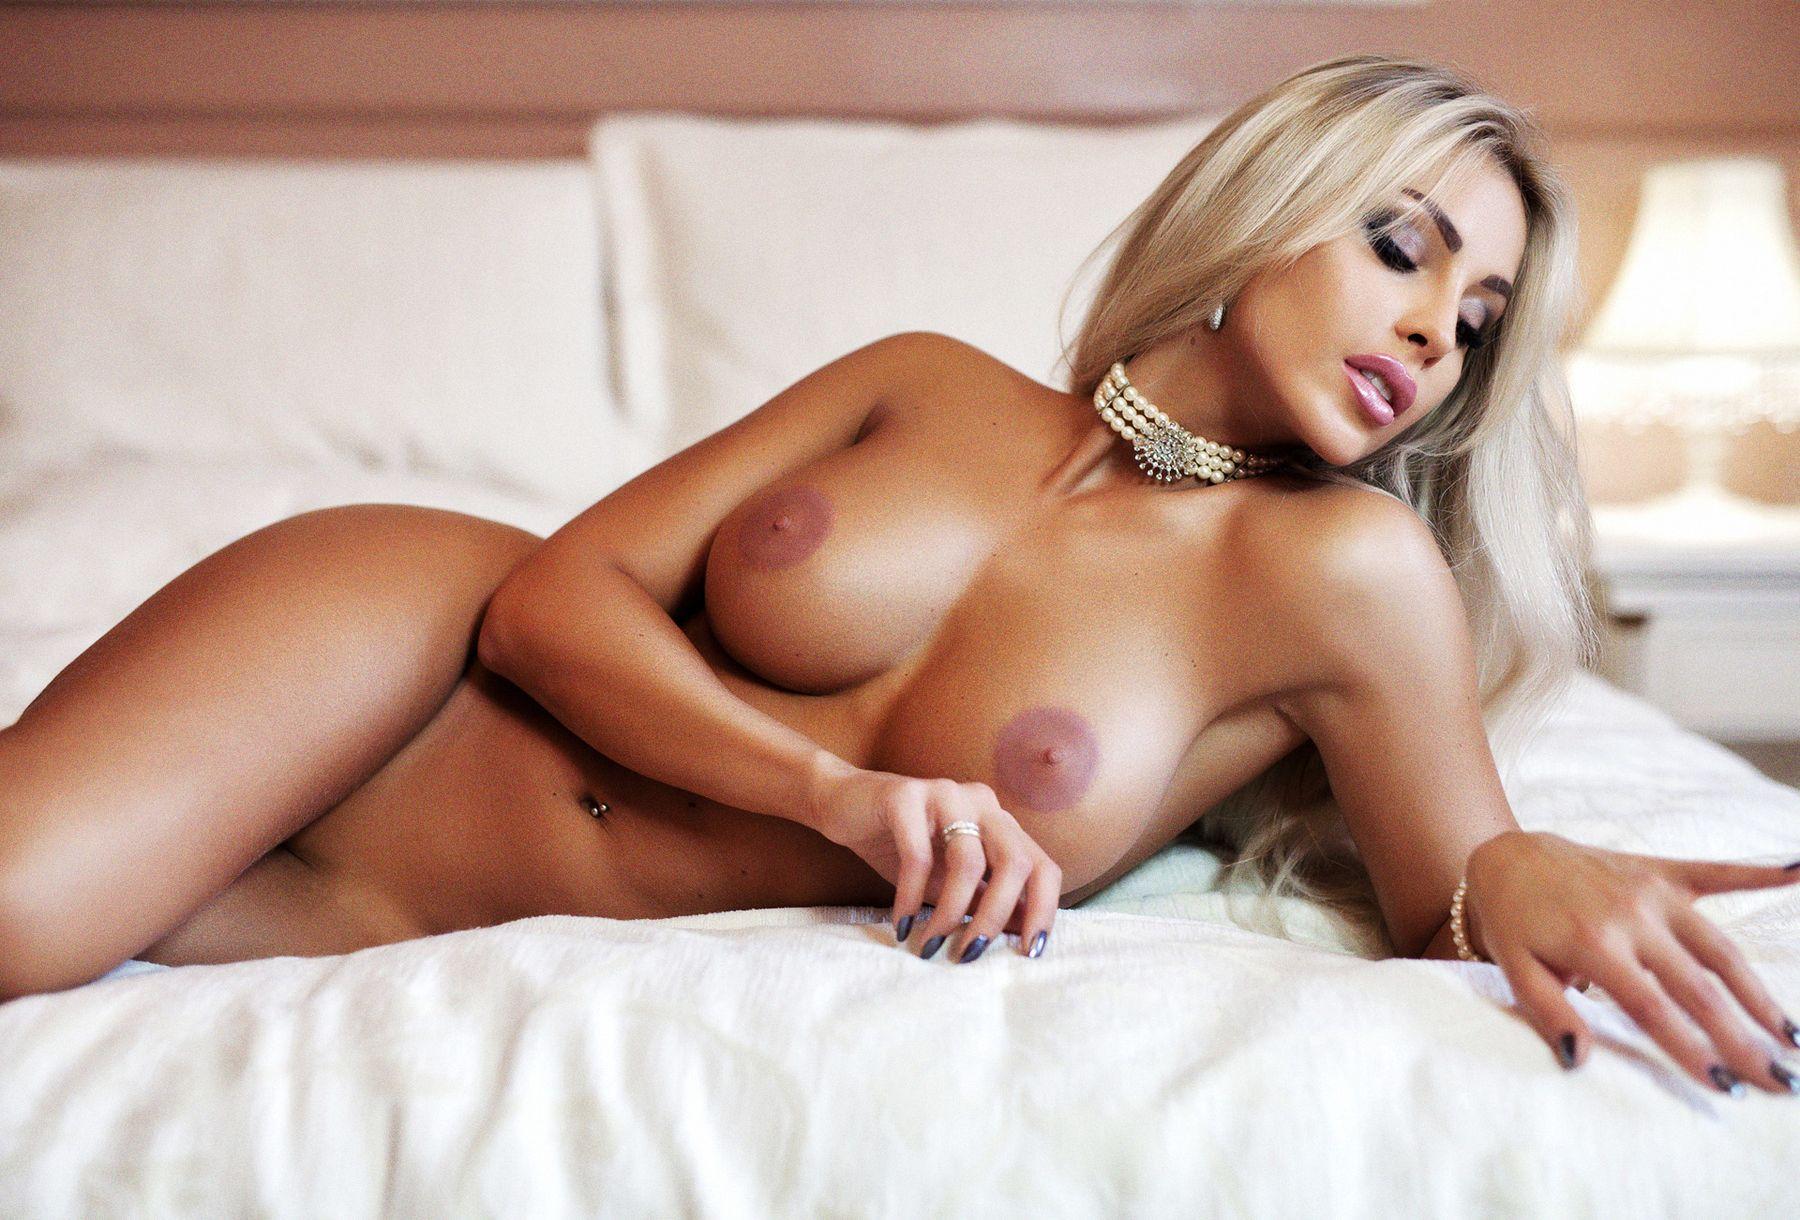 Hot Nude Blond